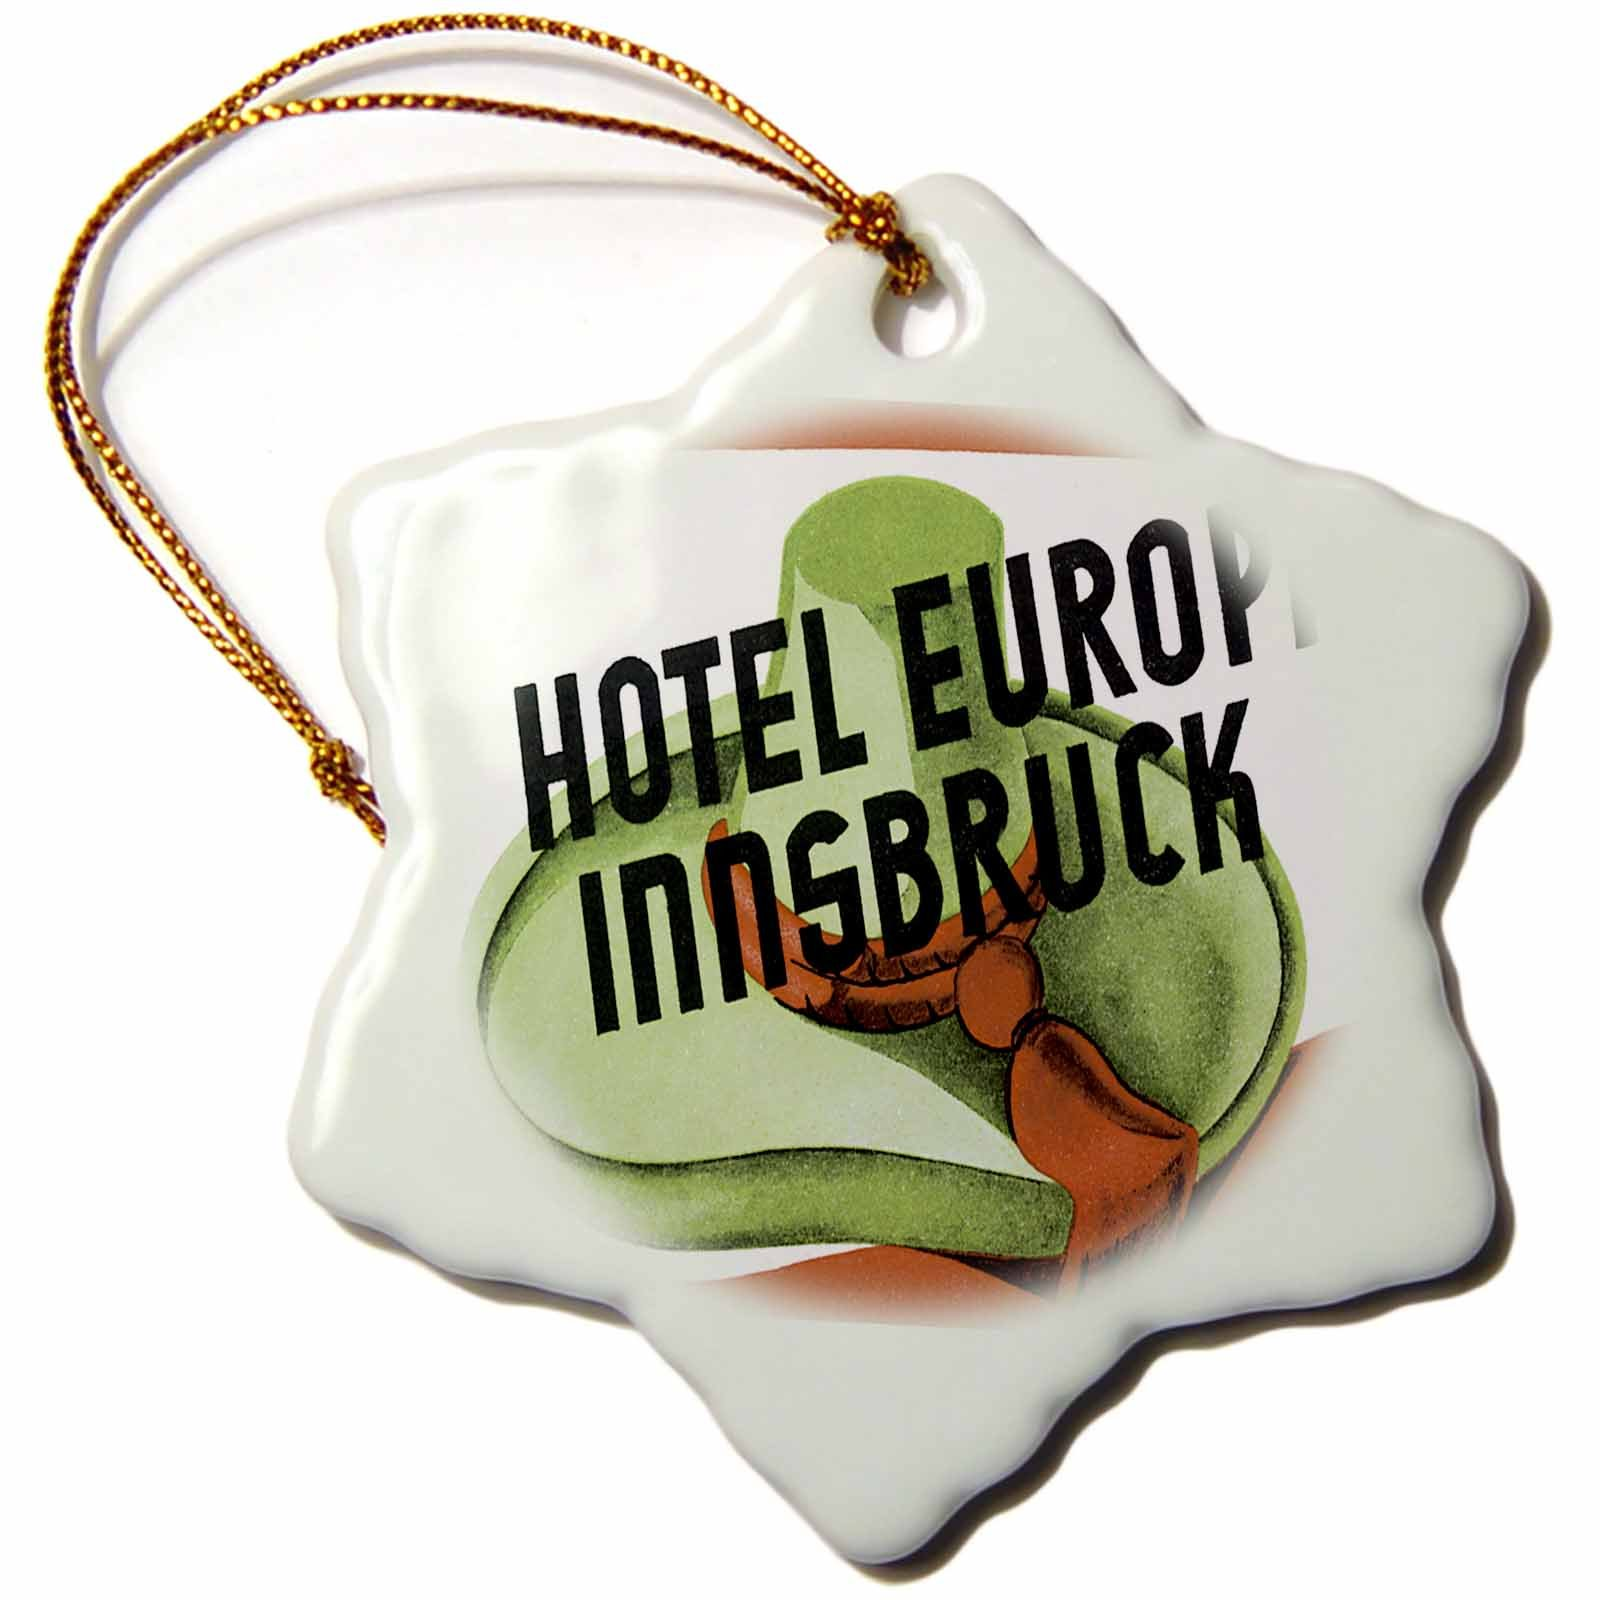 3dRose Vintage Hotel Europa Innsbruck Austria Luggage Label Snowflake Ornament, 3''